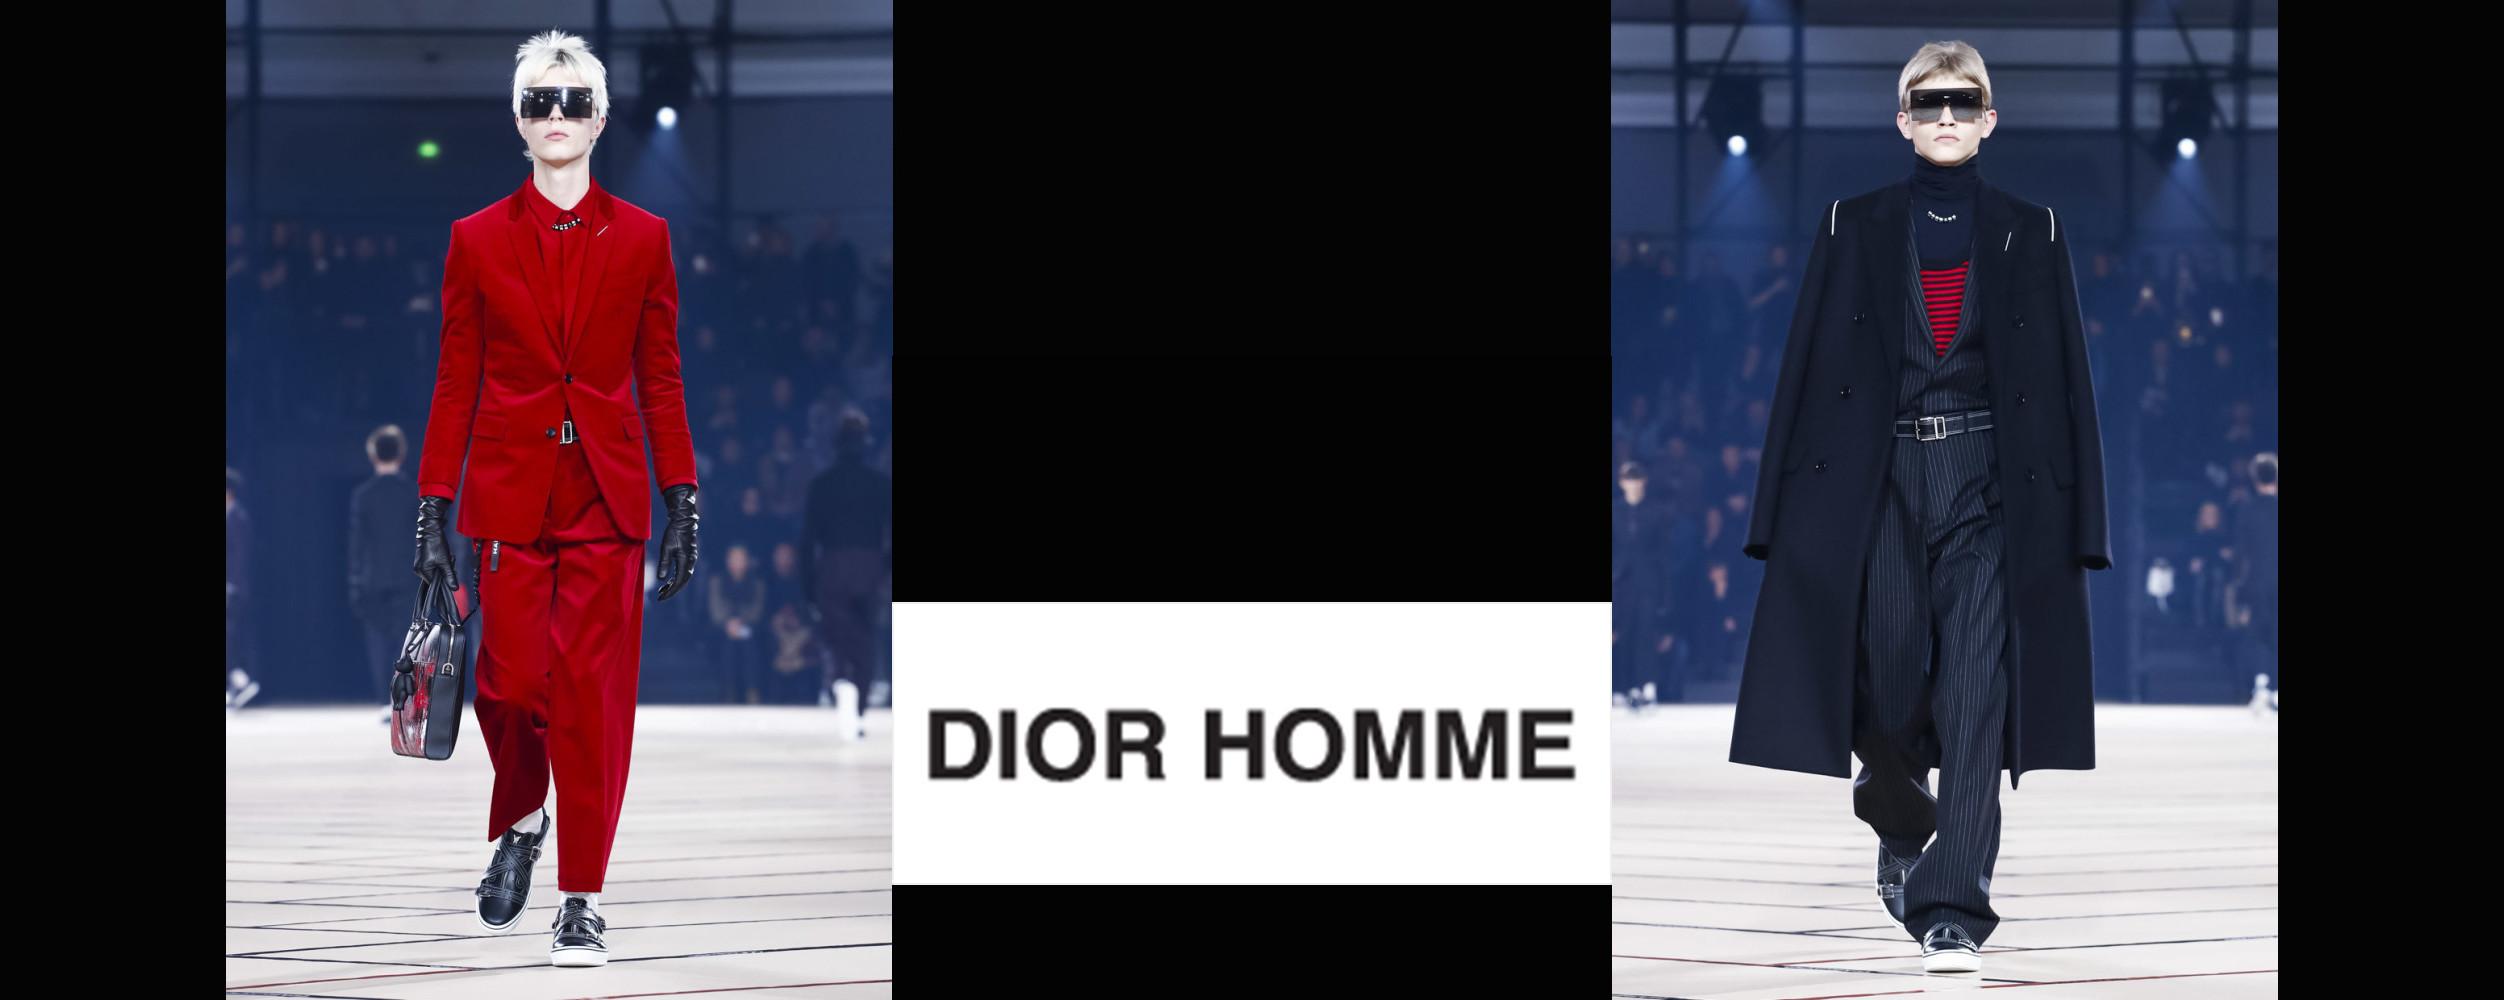 Dan Stewart & Jose Luis Lucero for Dior FW2017